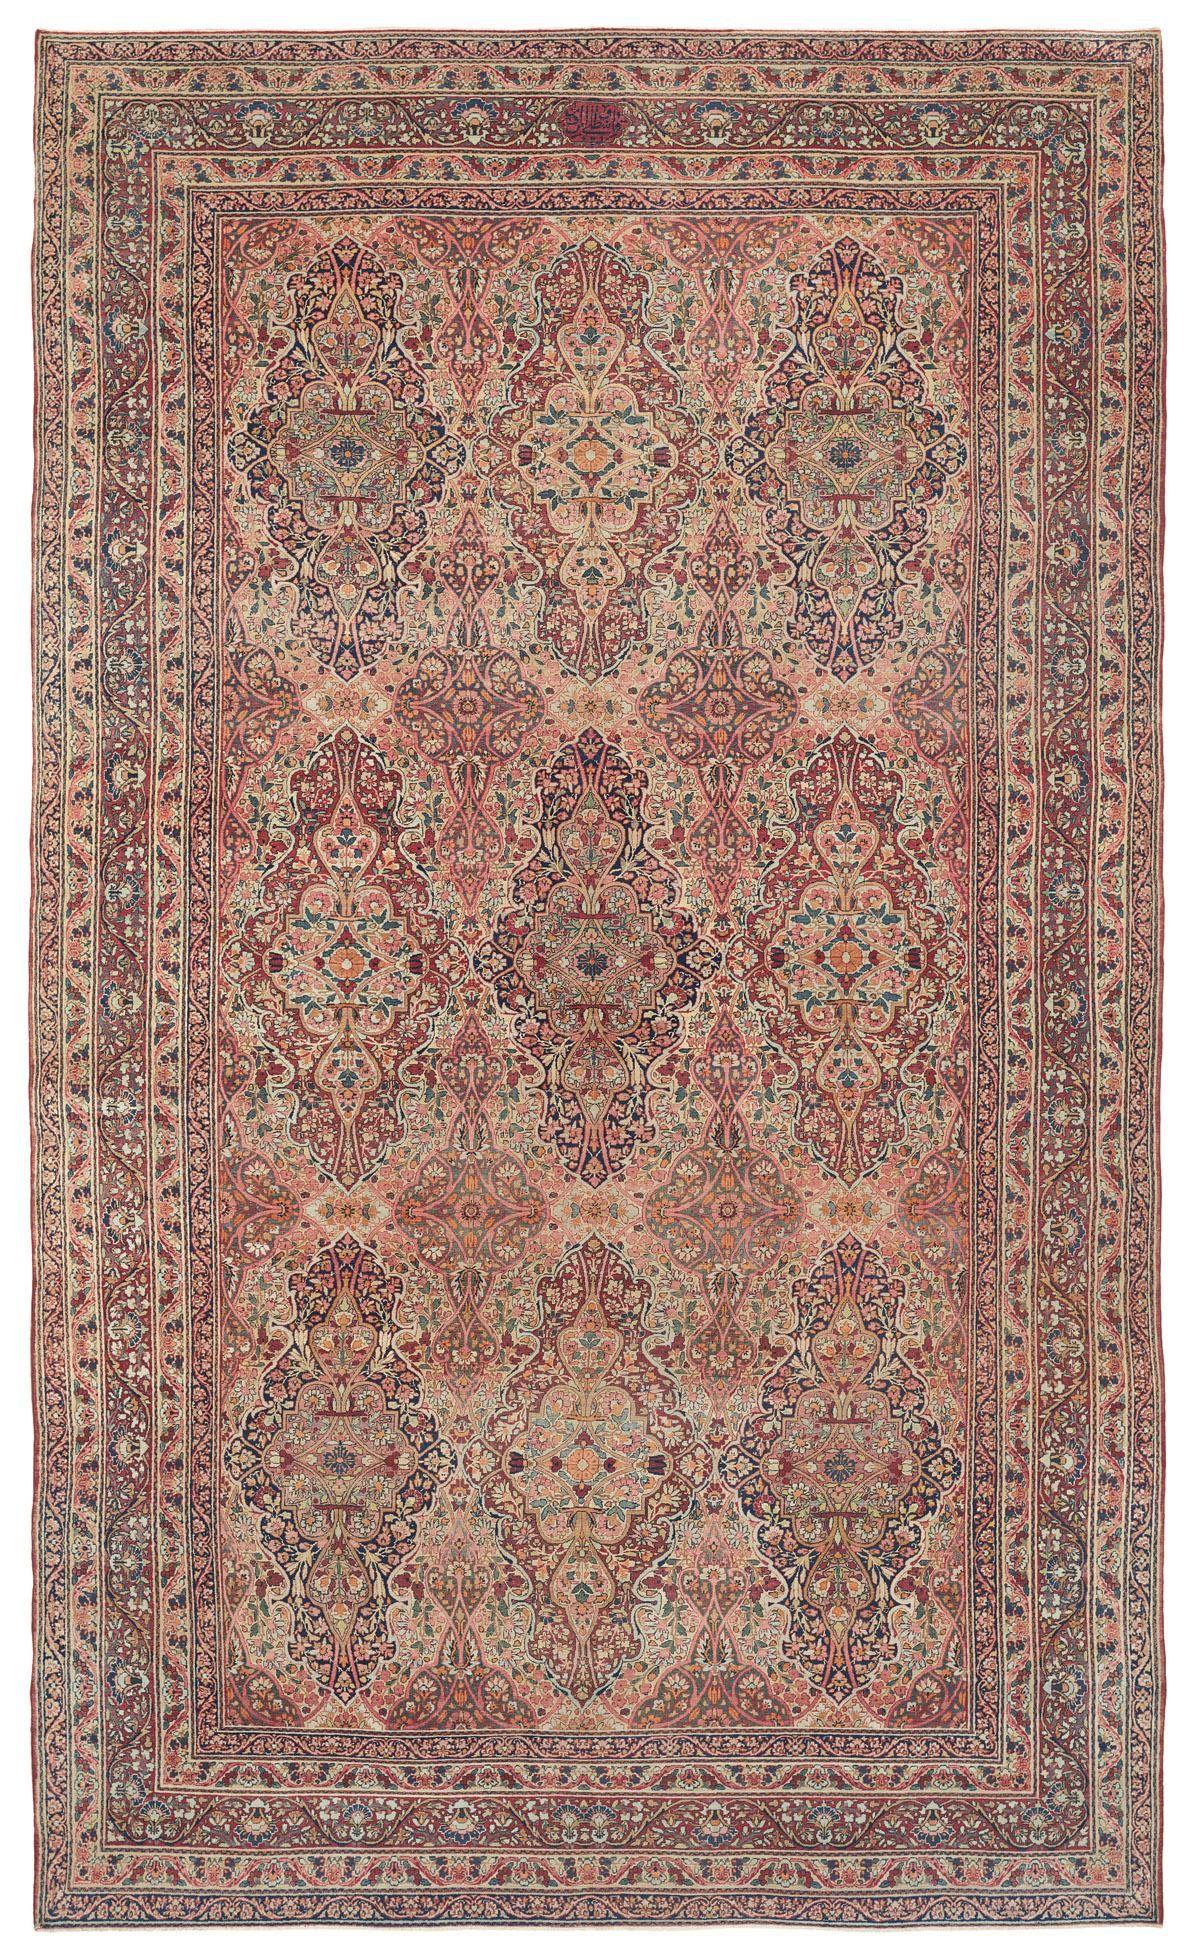 Antique Persian Kermanshah Room Size Oriental Carpet Antique